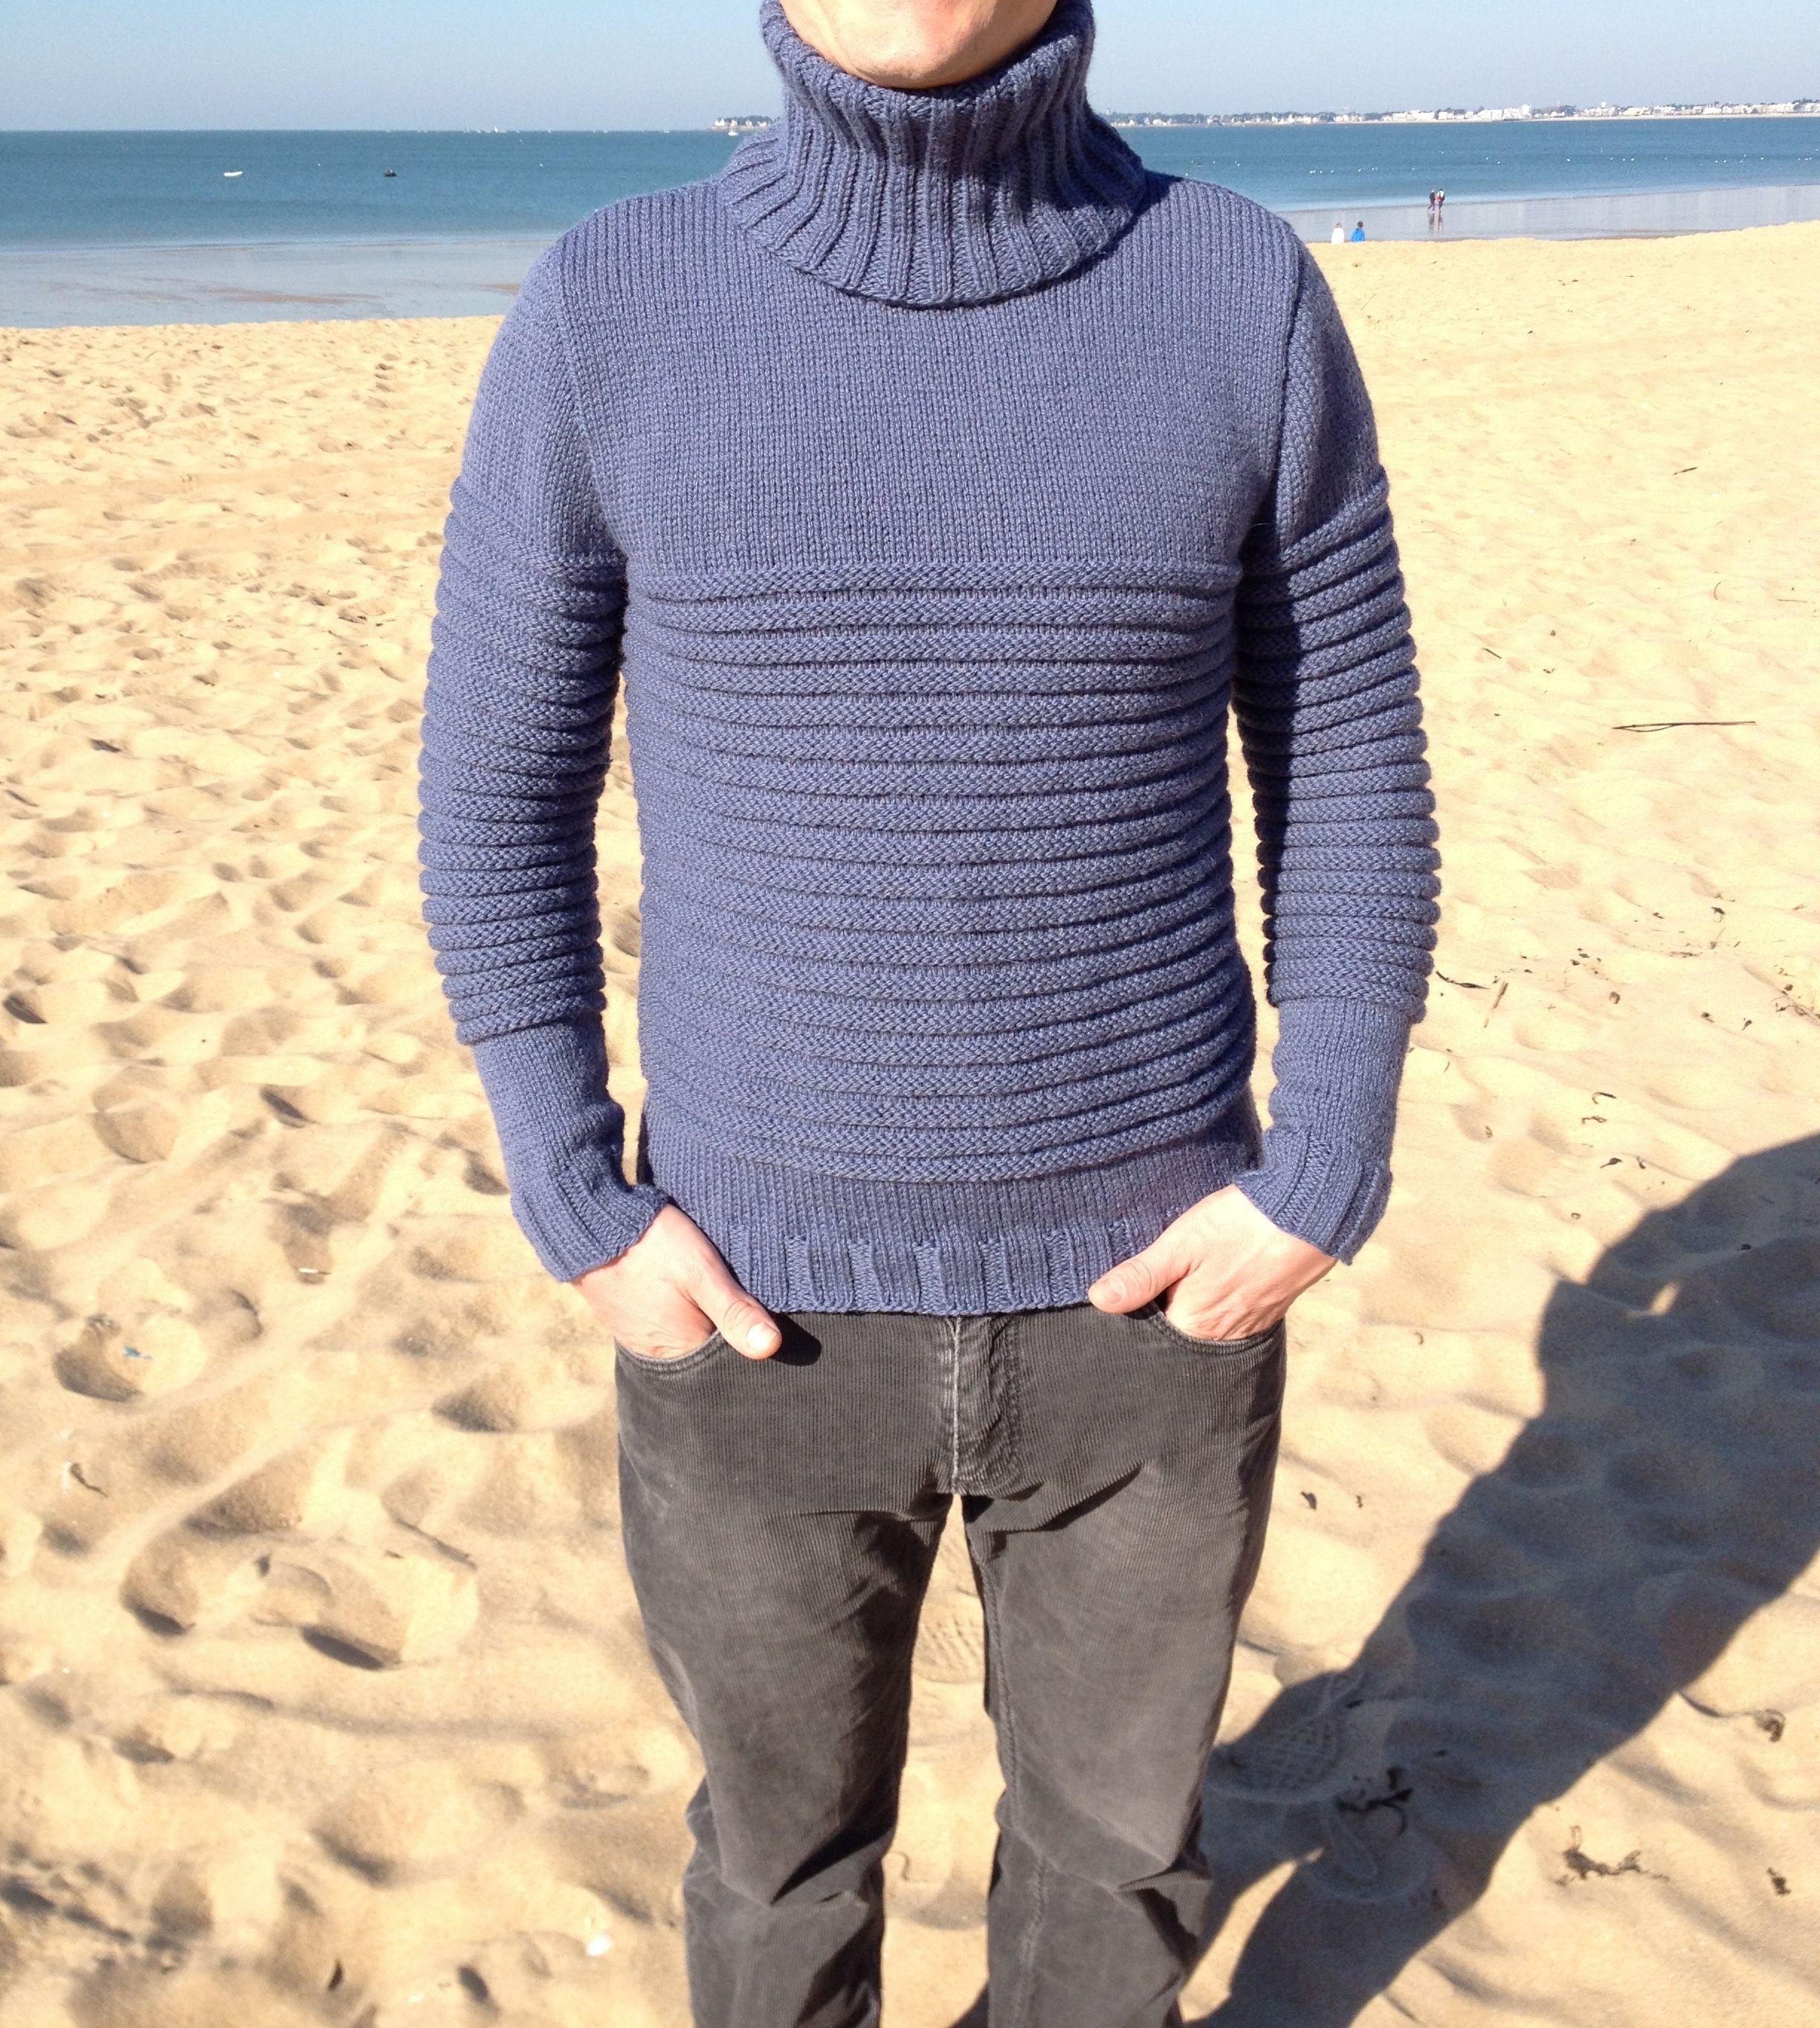 Pull du chéri - modèle Phildar / boyfriend sweater - pattern from Phildar